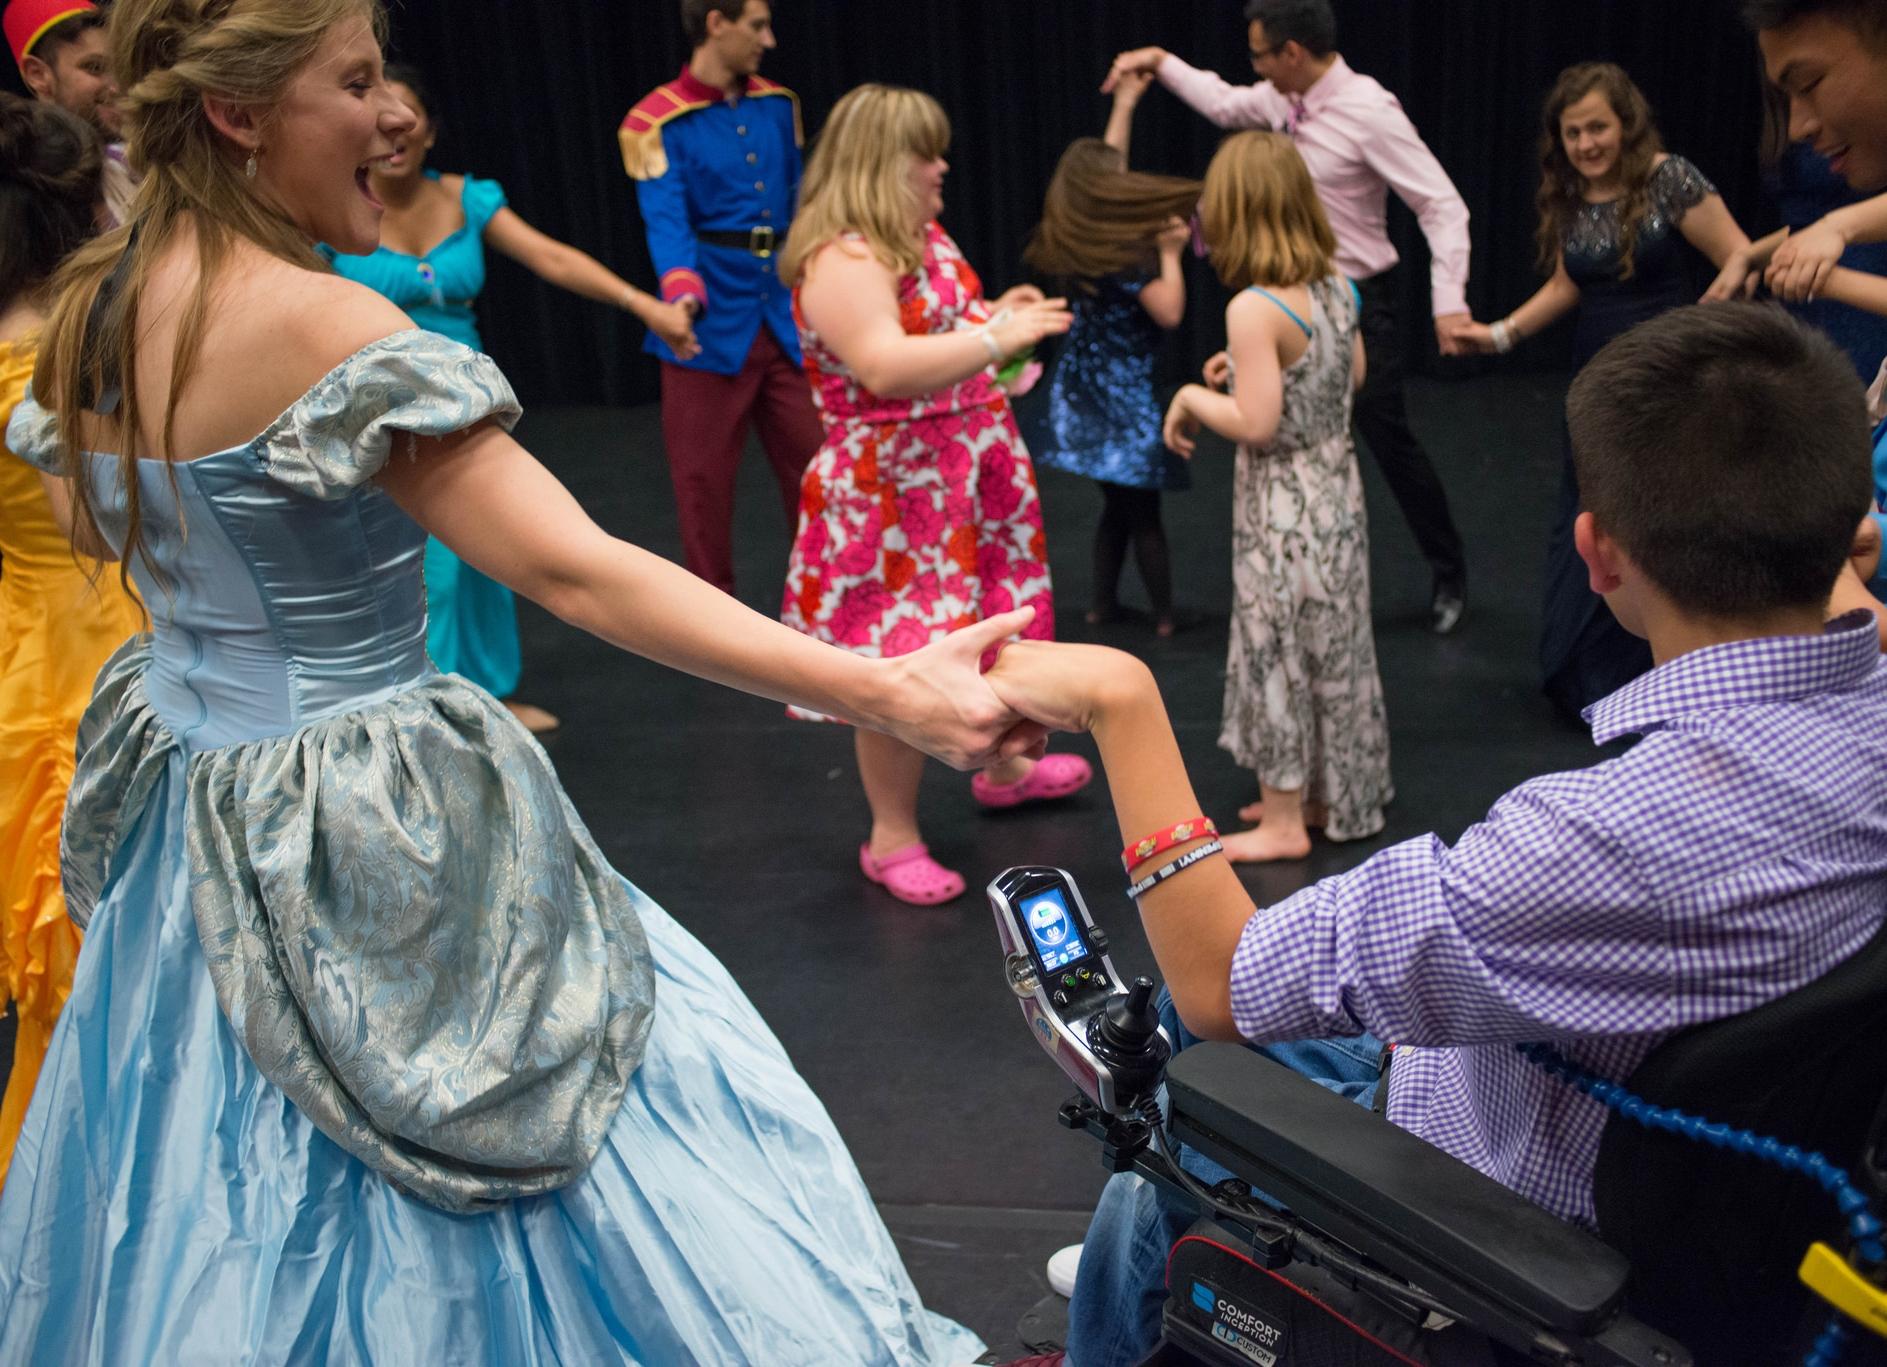 Pilot program for annual CBI Dance - for Austin Independent School District